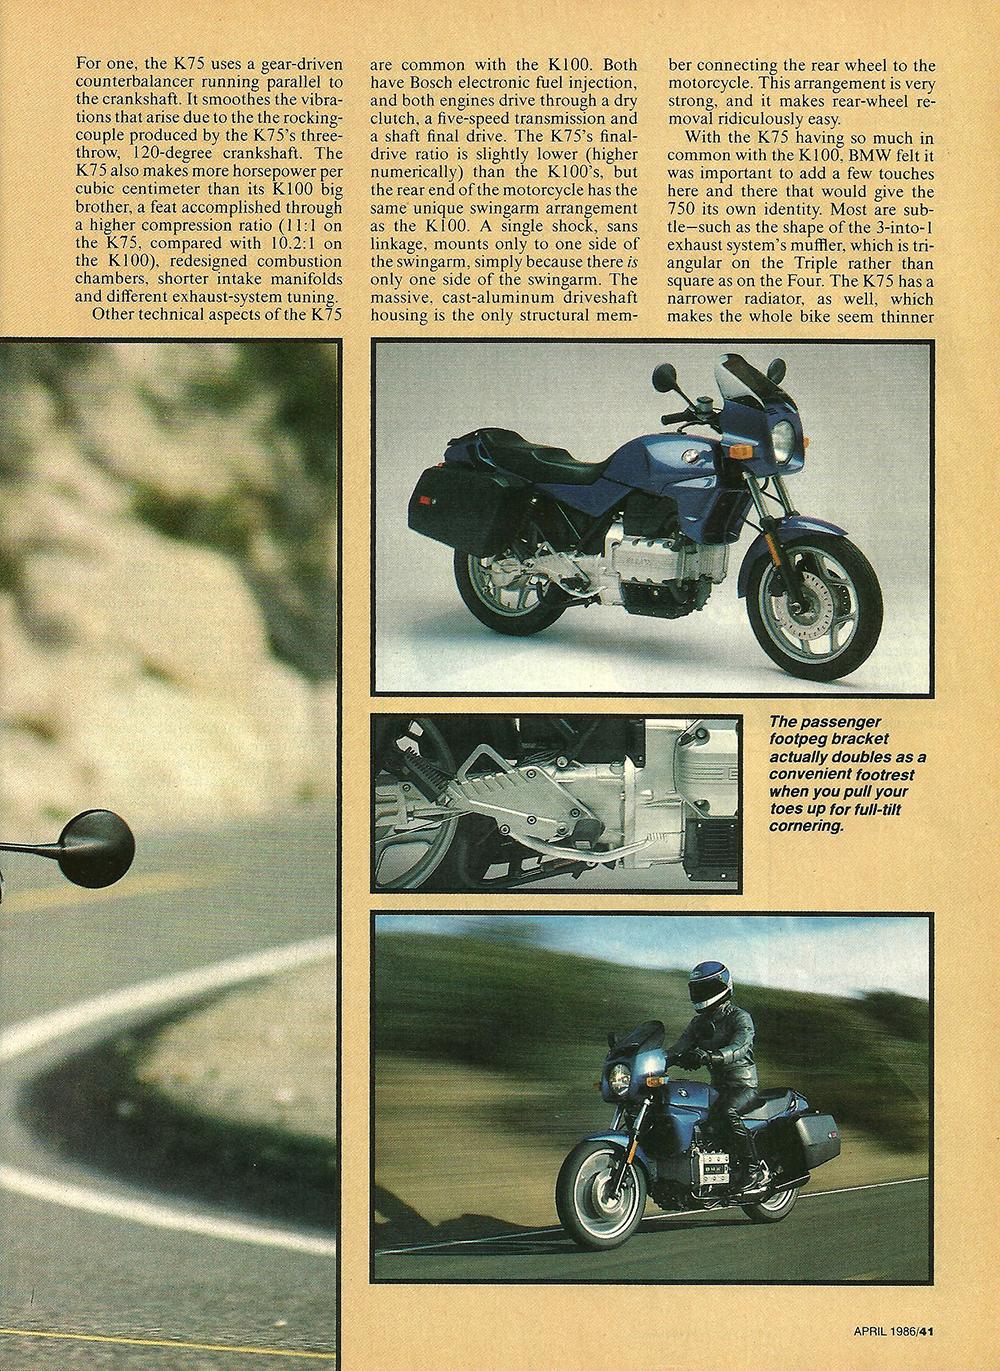 1986 BMW k75c road test 04.jpg